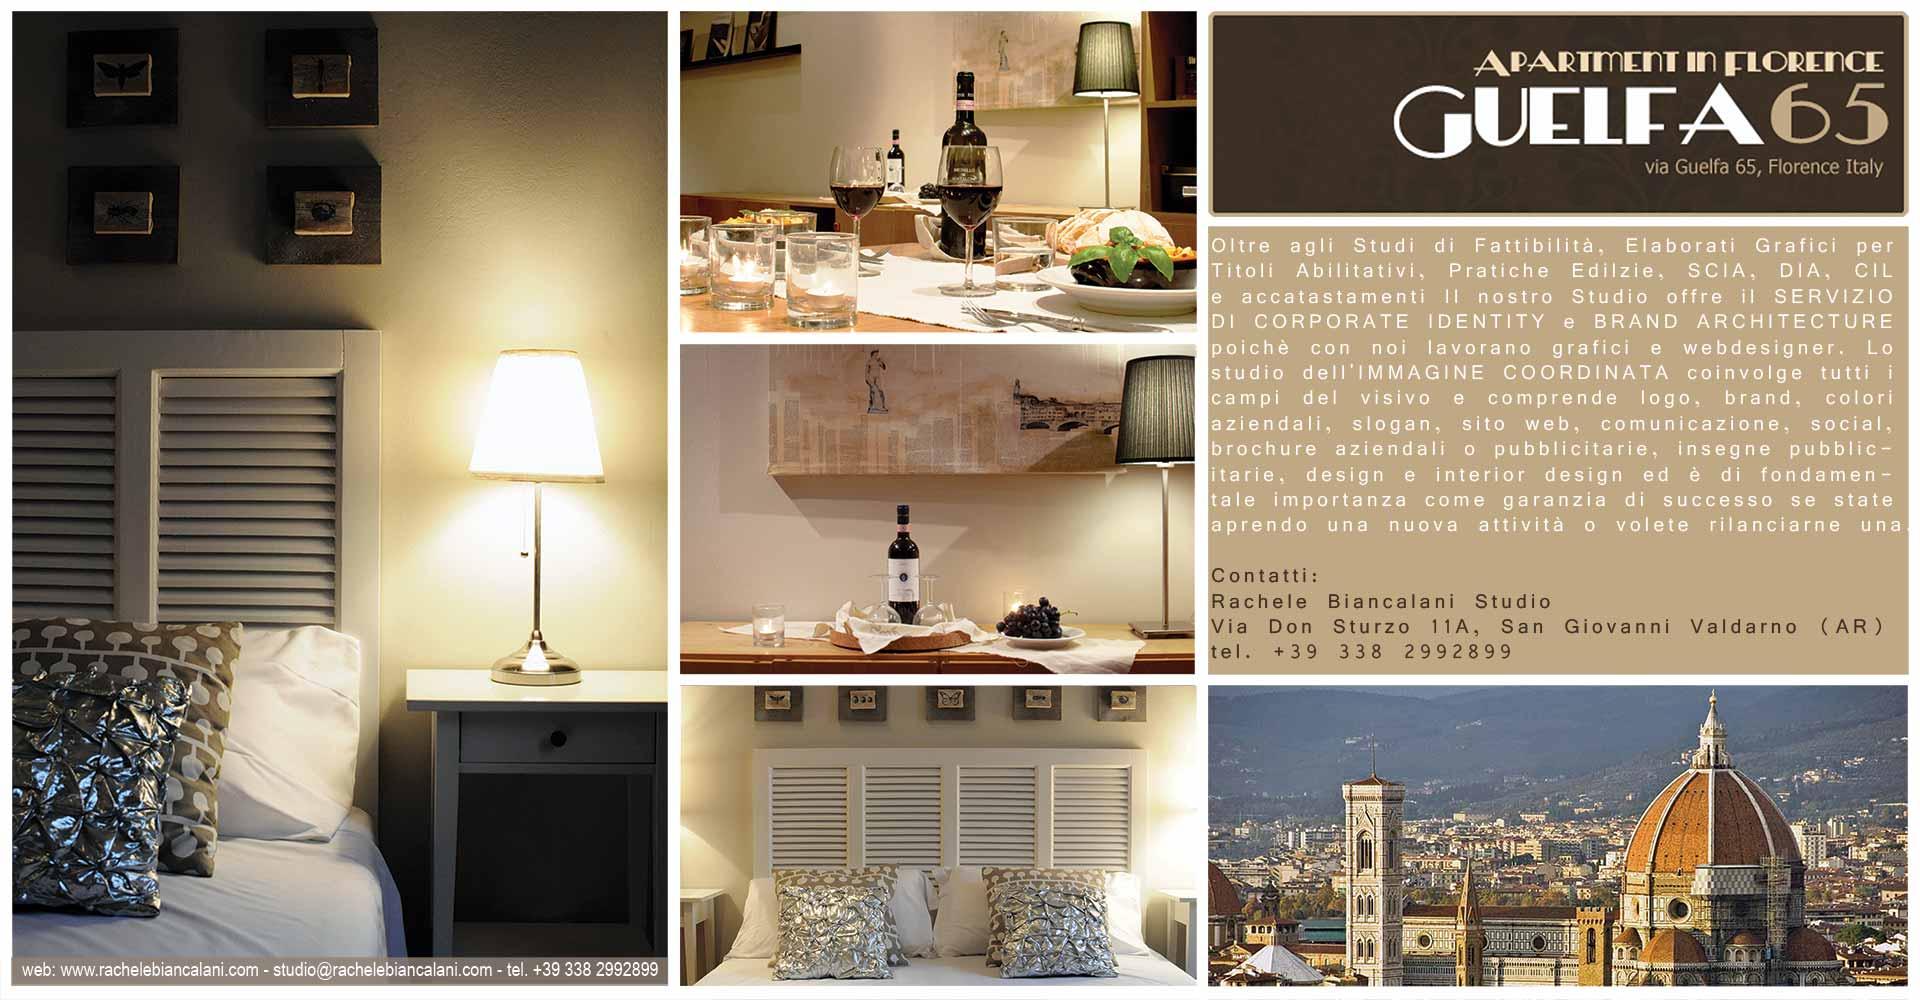 mobili su misura | rachele biancalani - Negozi Arredamento Design Firenze